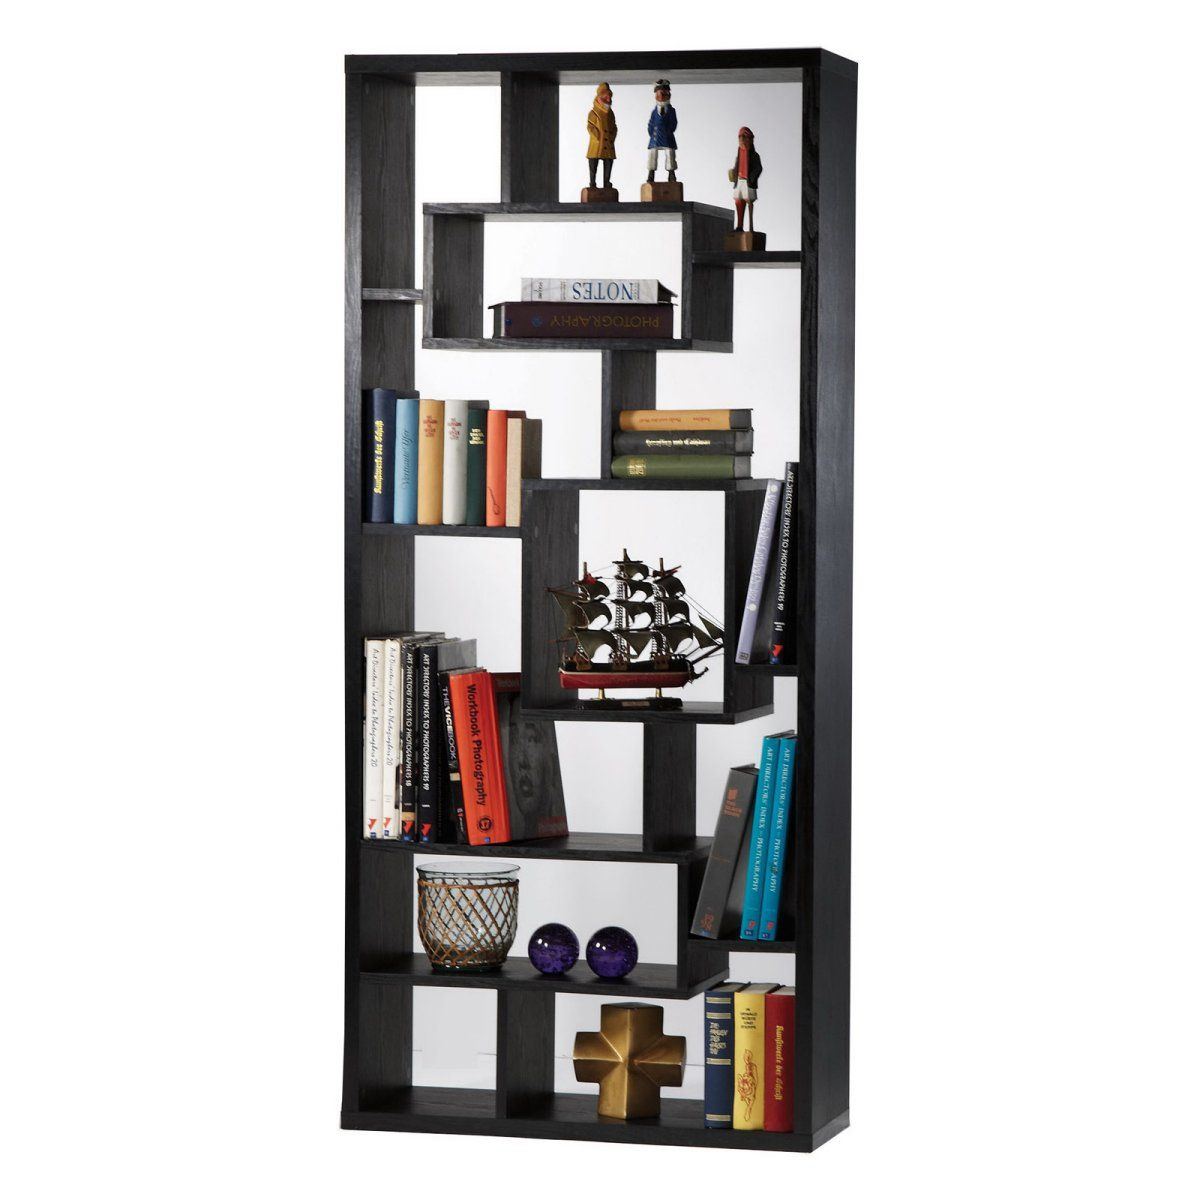 Sydney Bookcase Room Divider Design Ideas for Kristin Pinterest